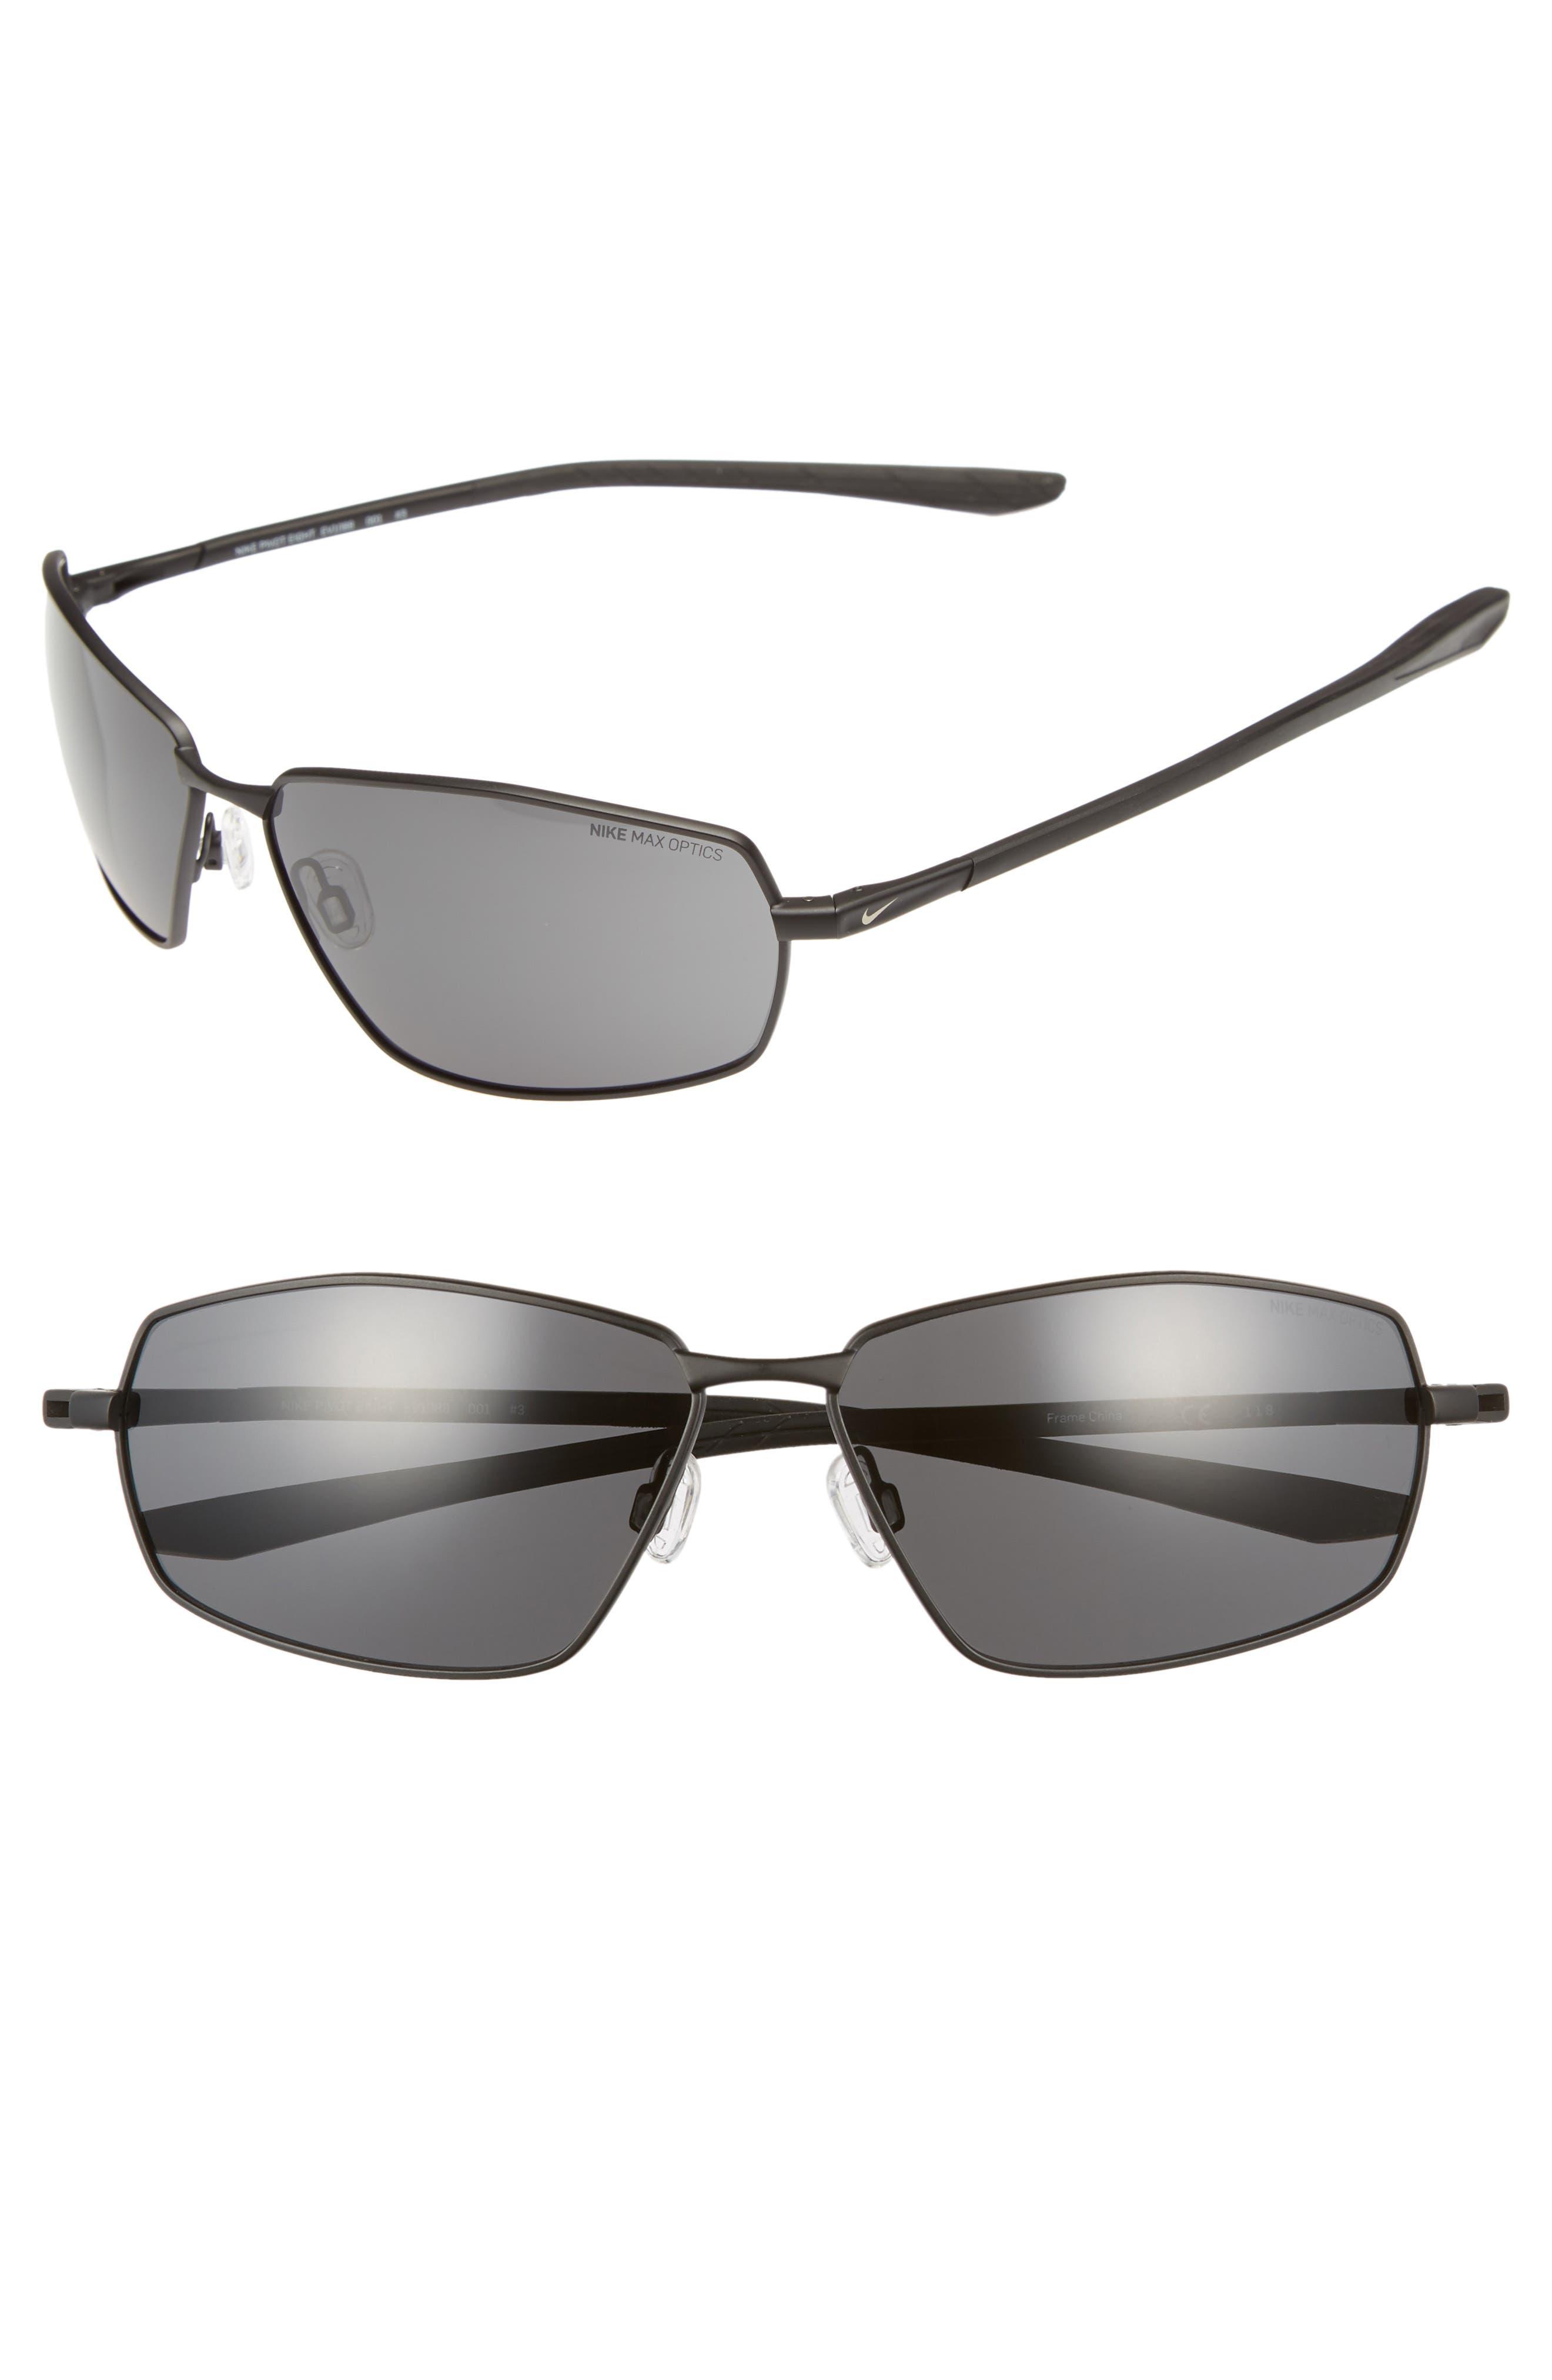 Nike Pivot Eight 6m Oversize Sunglasses - Satin Black/ Dark Grey